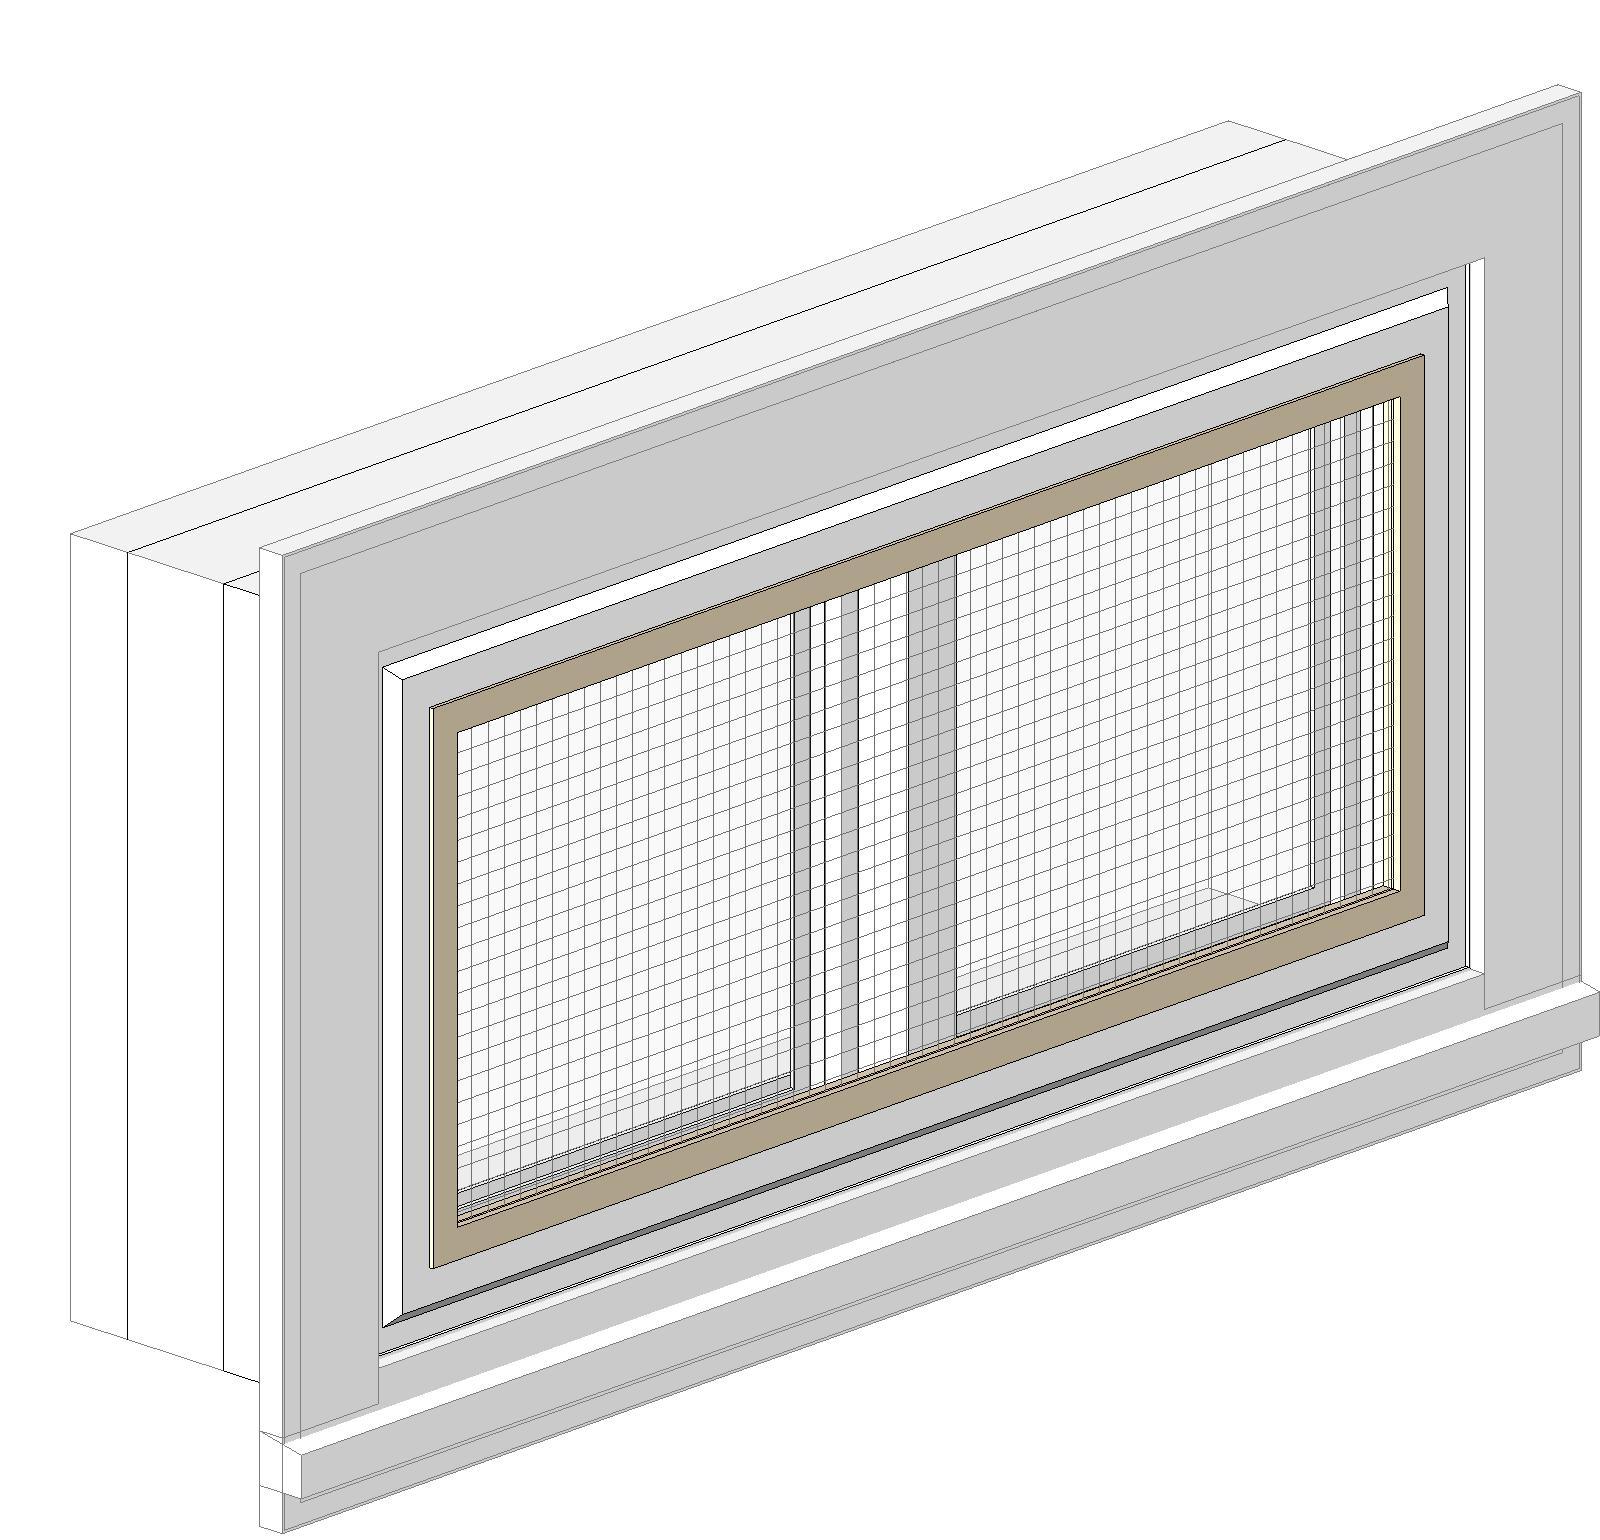 Bim objects families for Harvey windows